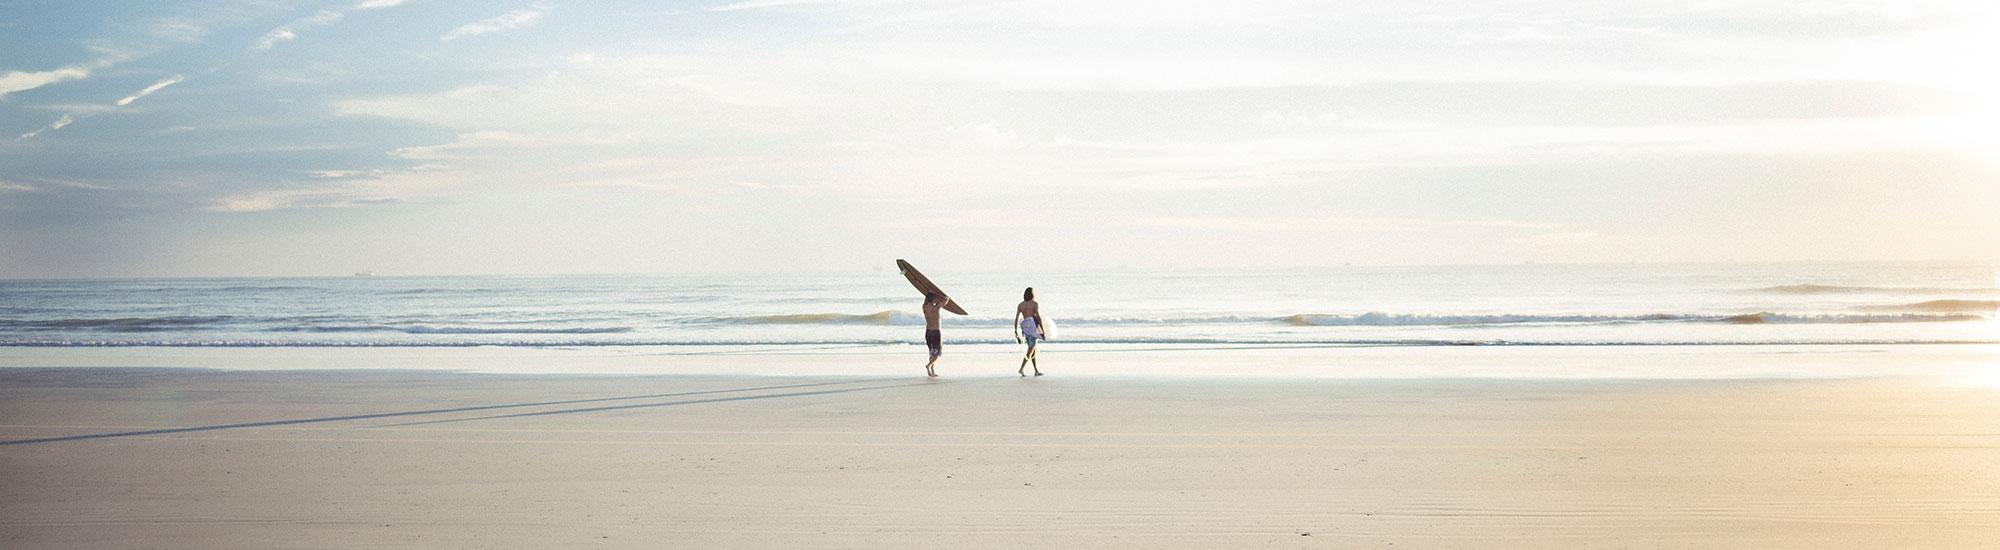 private surf lessons - 2019 Season